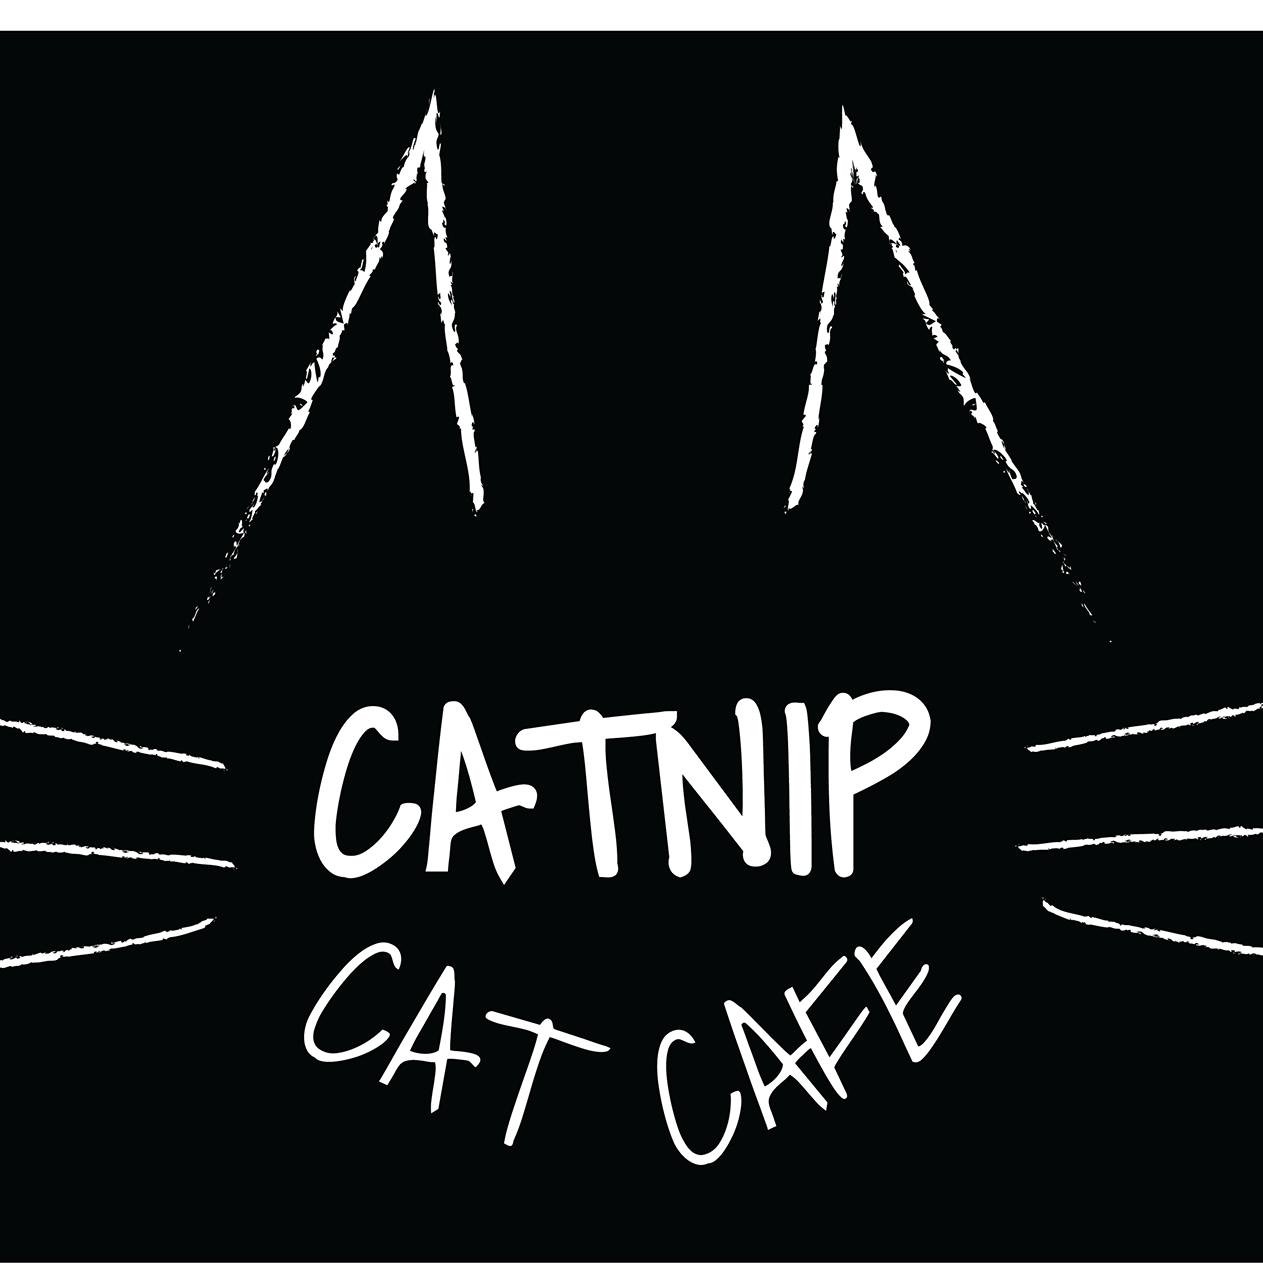 CATNIP CAT CAFE - 2200 Colonial AvenueSuites #19 and 20Norfolk, VA 23517